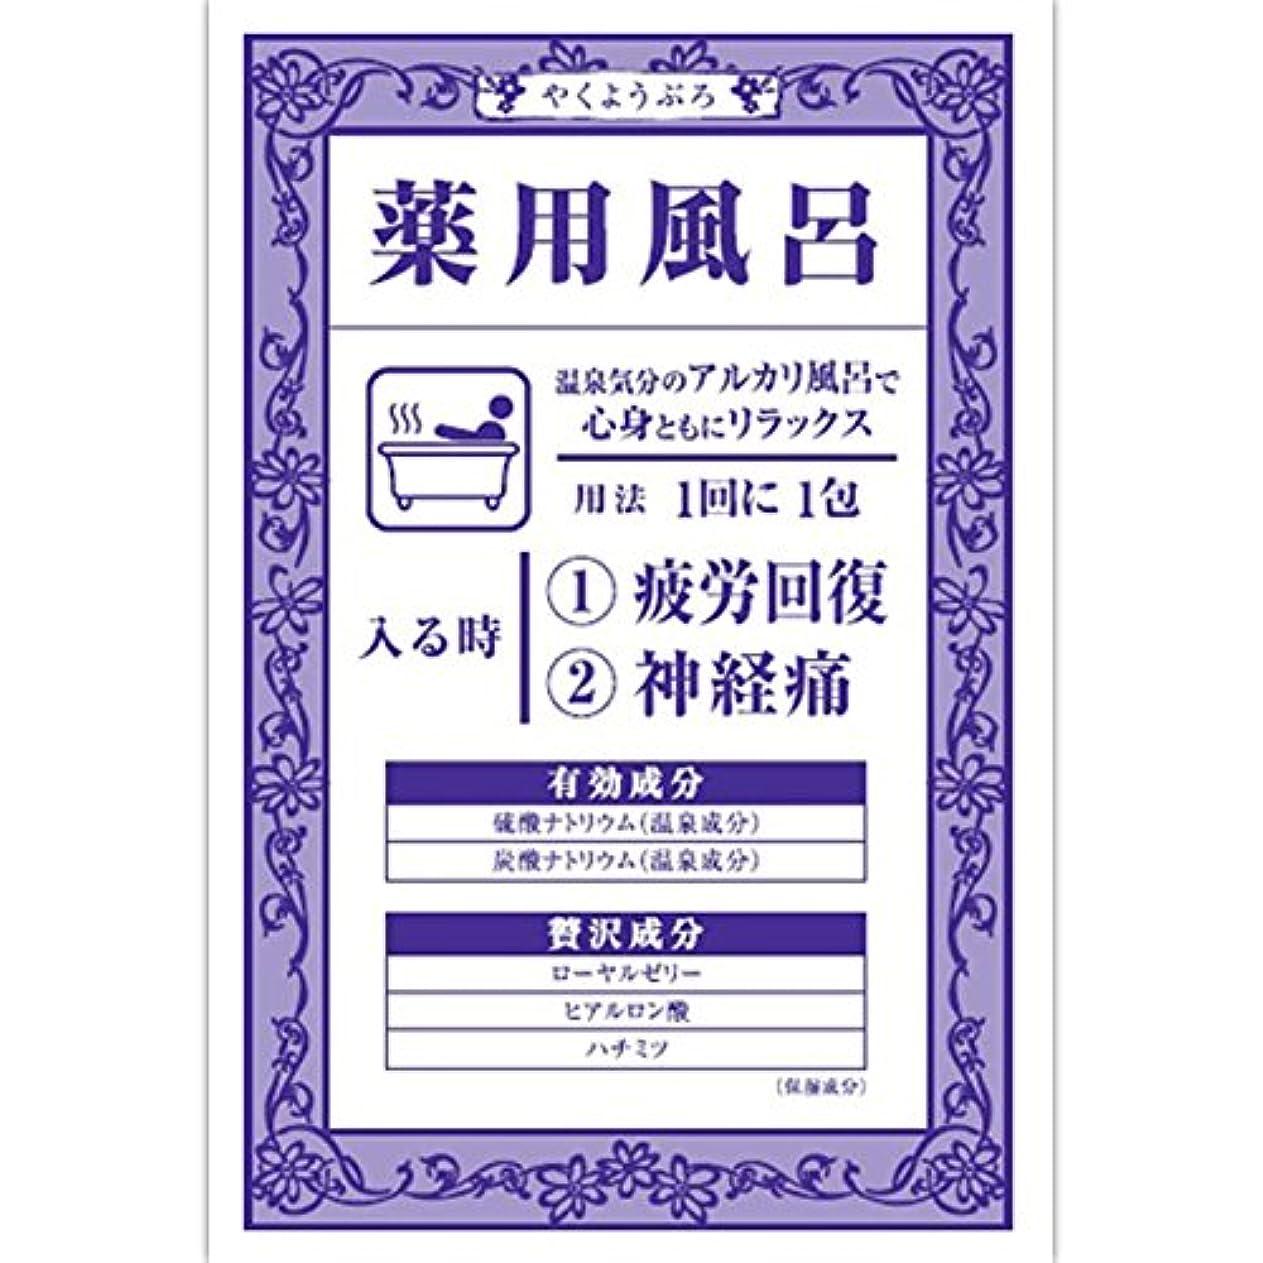 最小仕立て屋アライメント大山 薬用風呂KKd(疲労回復?神経痛) 40G(医薬部外品)